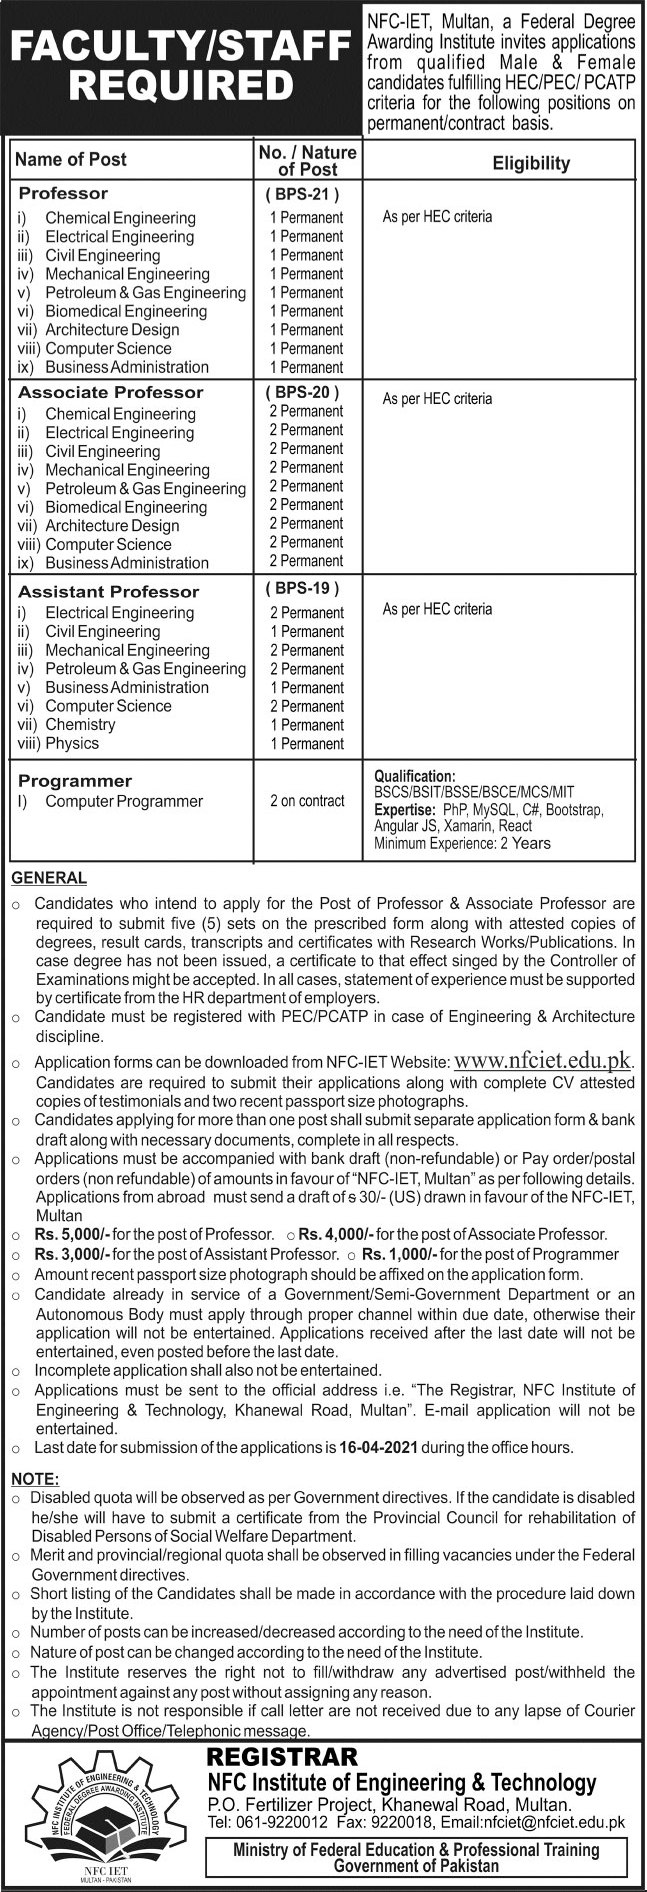 Institute of Engineering & Technology NFC Jobs in Multan